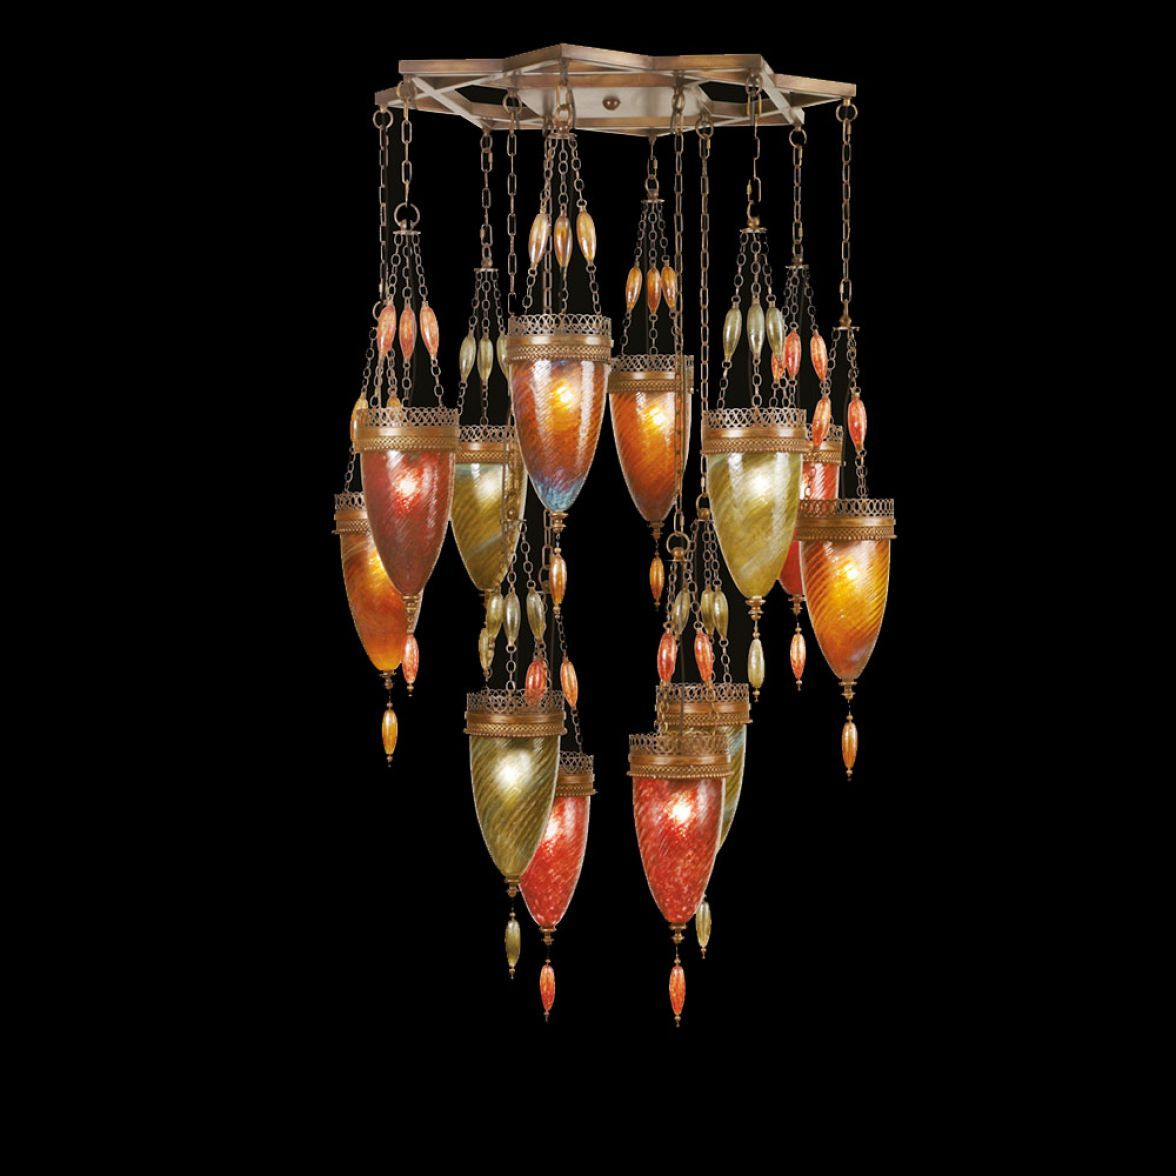 Scheherazade chandelier